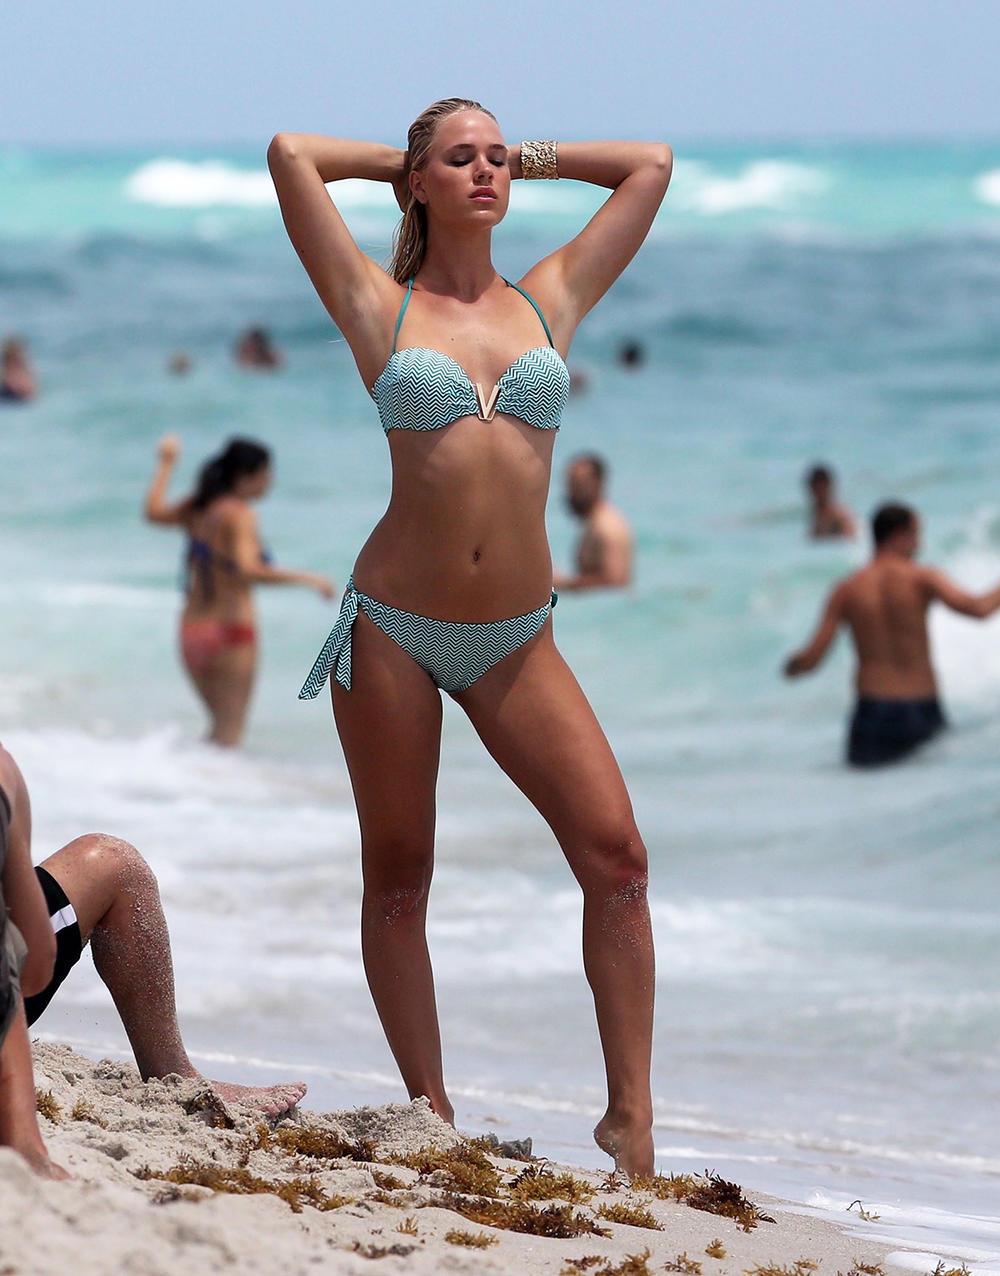 Holly Graves nude (59 photos), Tits, Is a cute, Boobs, in bikini 2006